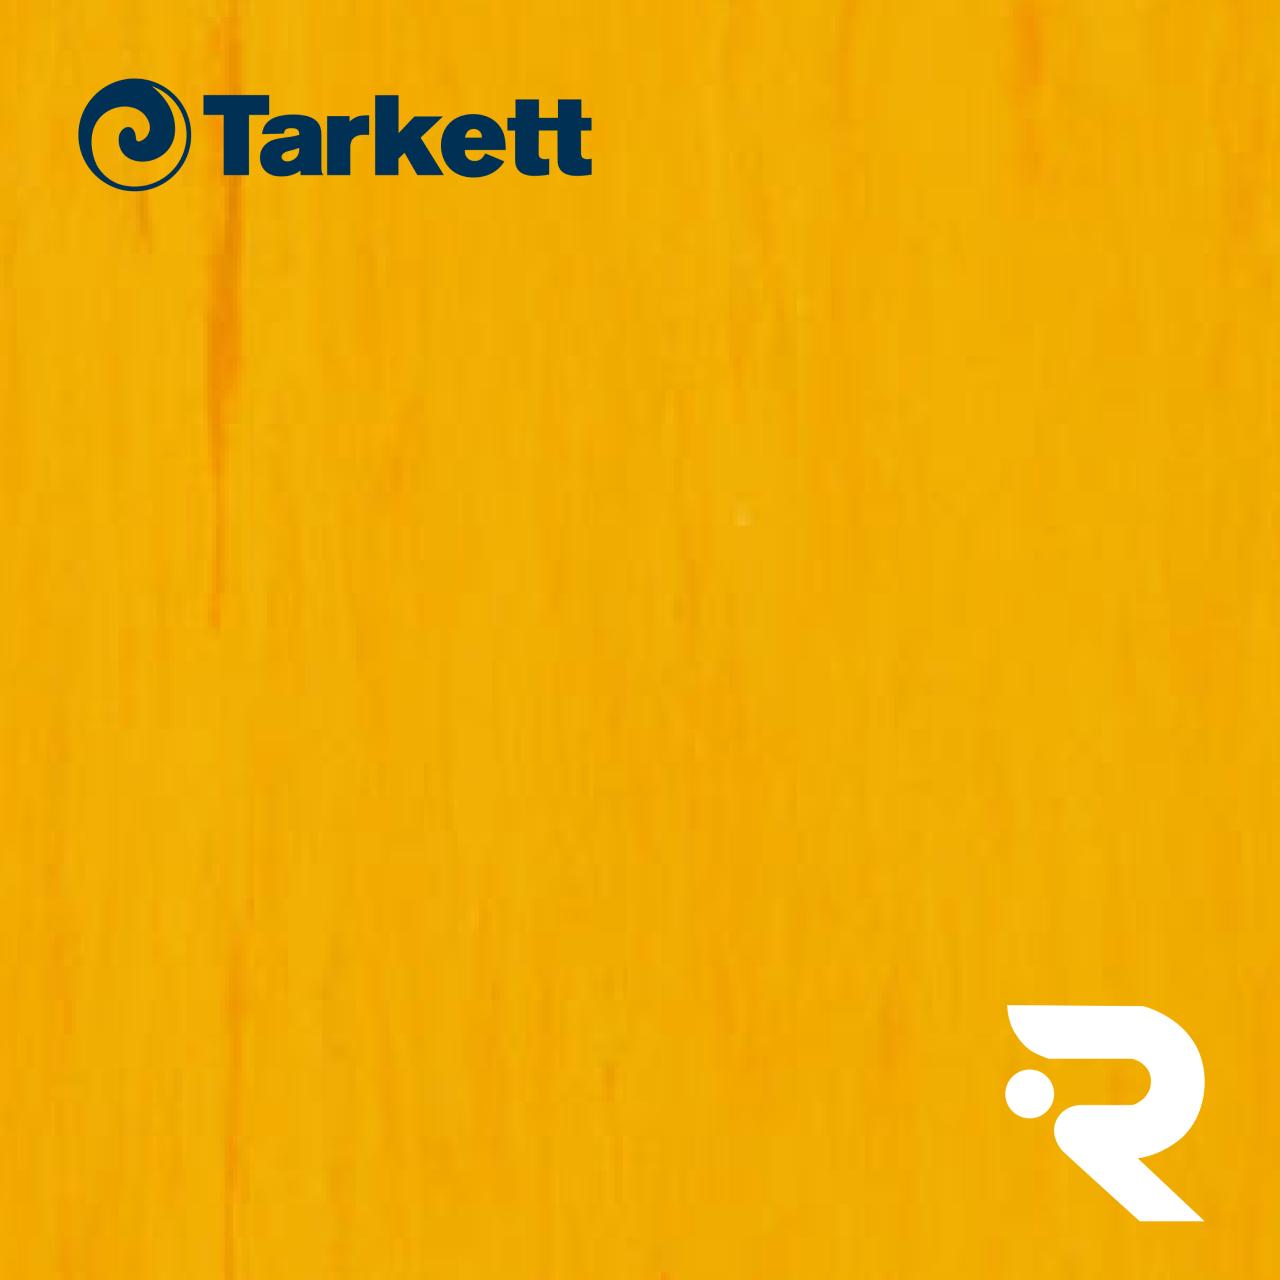 🏫 Гомогенный линолеум Tarkett | Standard ORANGE 0917 | Standard Plus 2.0 mm | 2 х 23 м